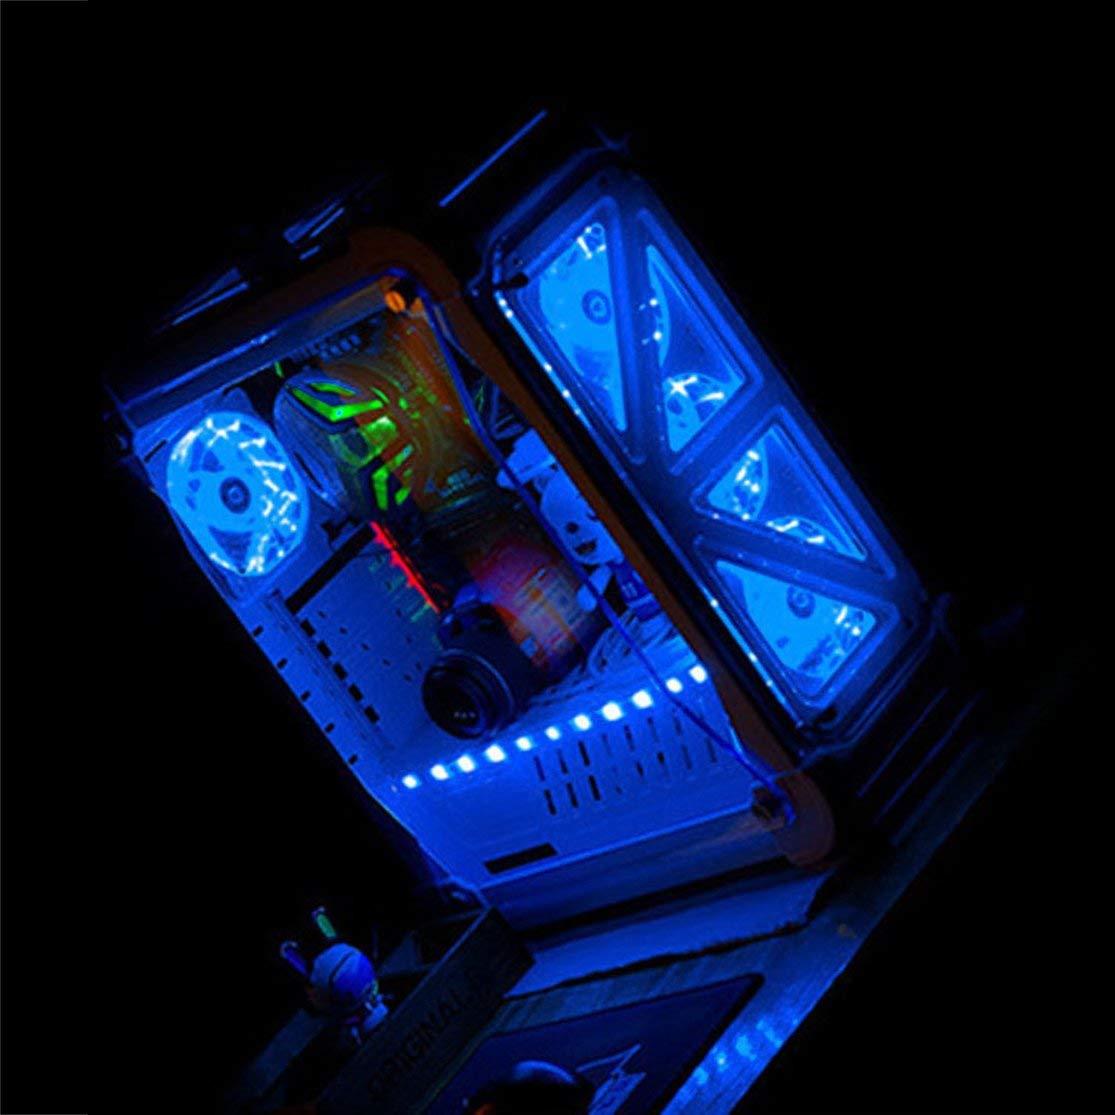 Kaemma Ventilador de Caja de PC con computadora Ultra silenciosa LED de 120 mm 15 LED 12V con Conector silencioso de Goma Molex Ventilador f/ácil de Instalar Color:Blue Light